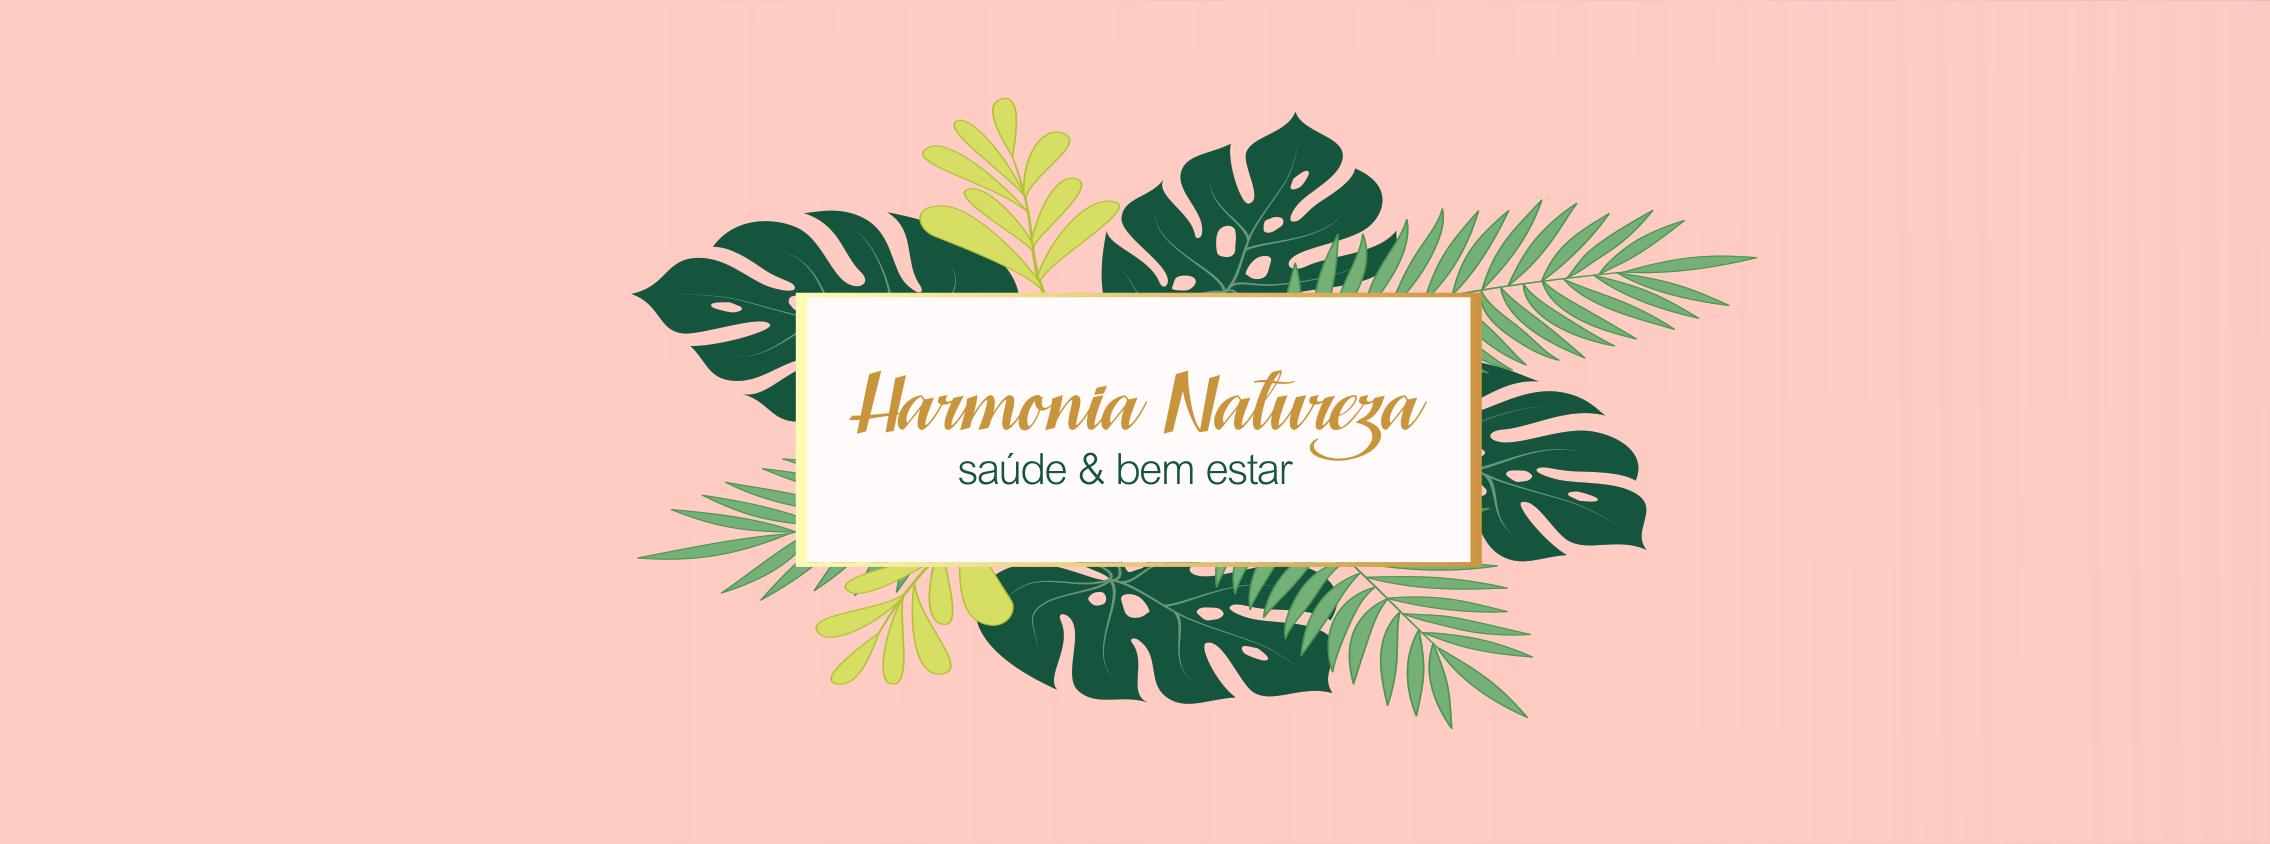 Harmonia Natureza